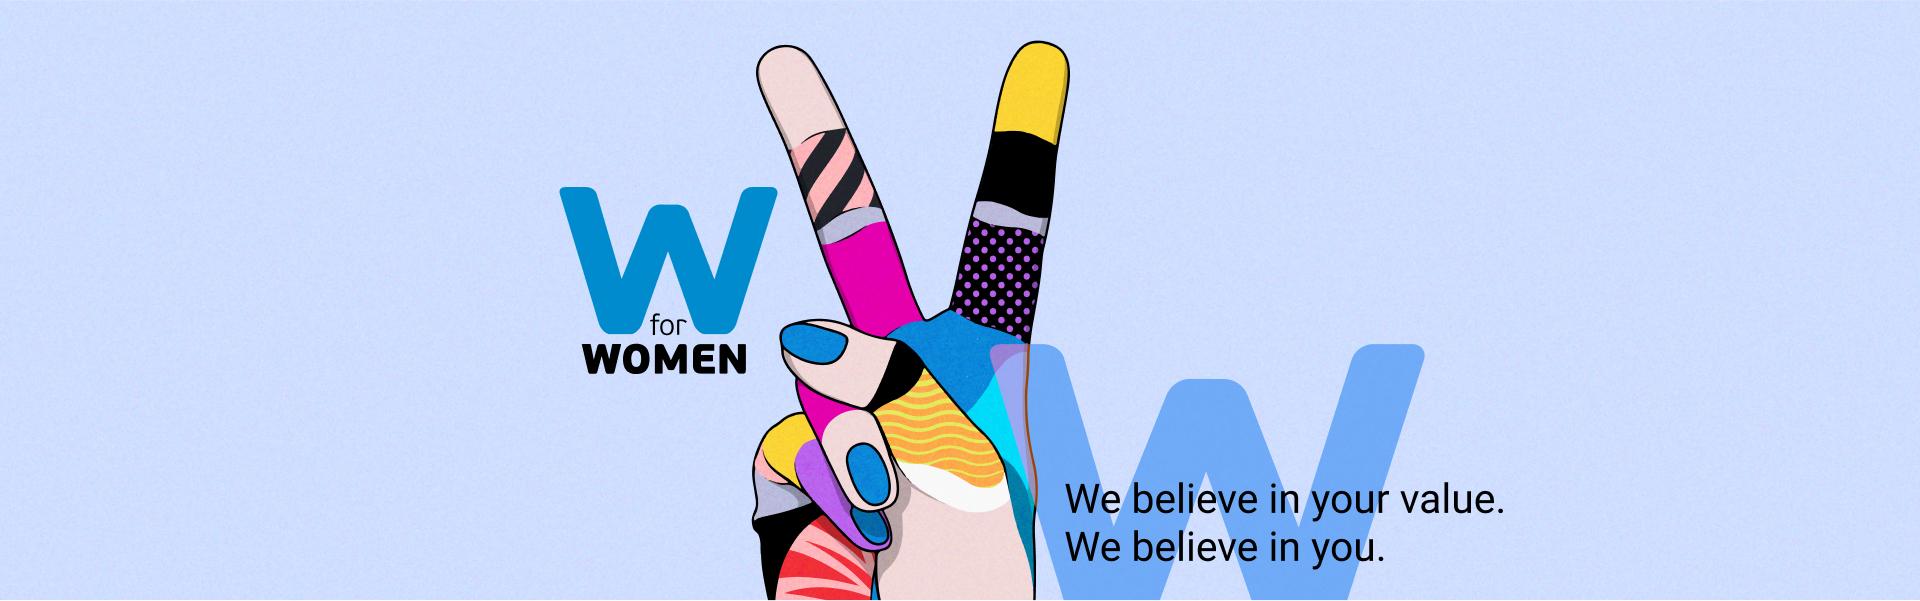 W4 women-banner